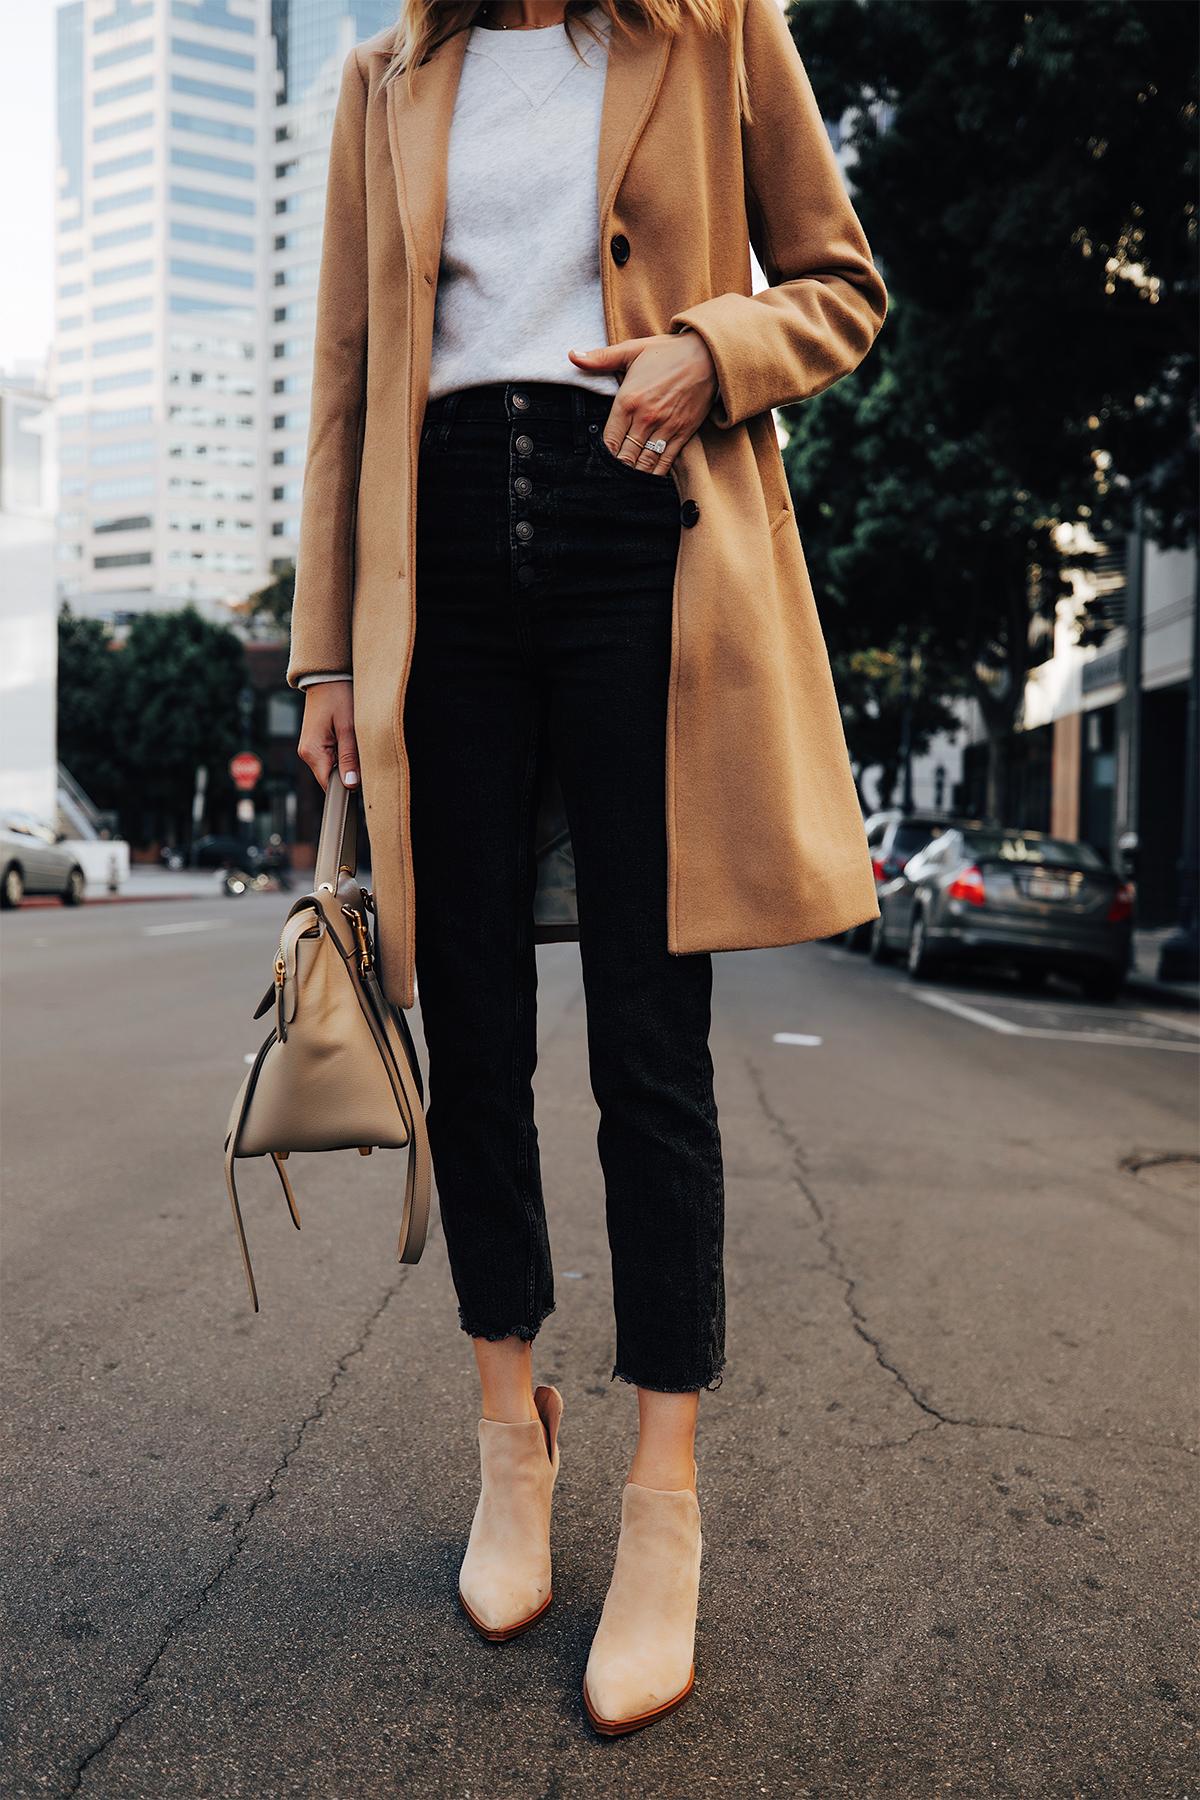 Fashion Jackson Wearing Abercrombie Camel Coat Grey Sweatshirt Black Raw Hem Jeans Tan Suede Booties Fall Outfit 2